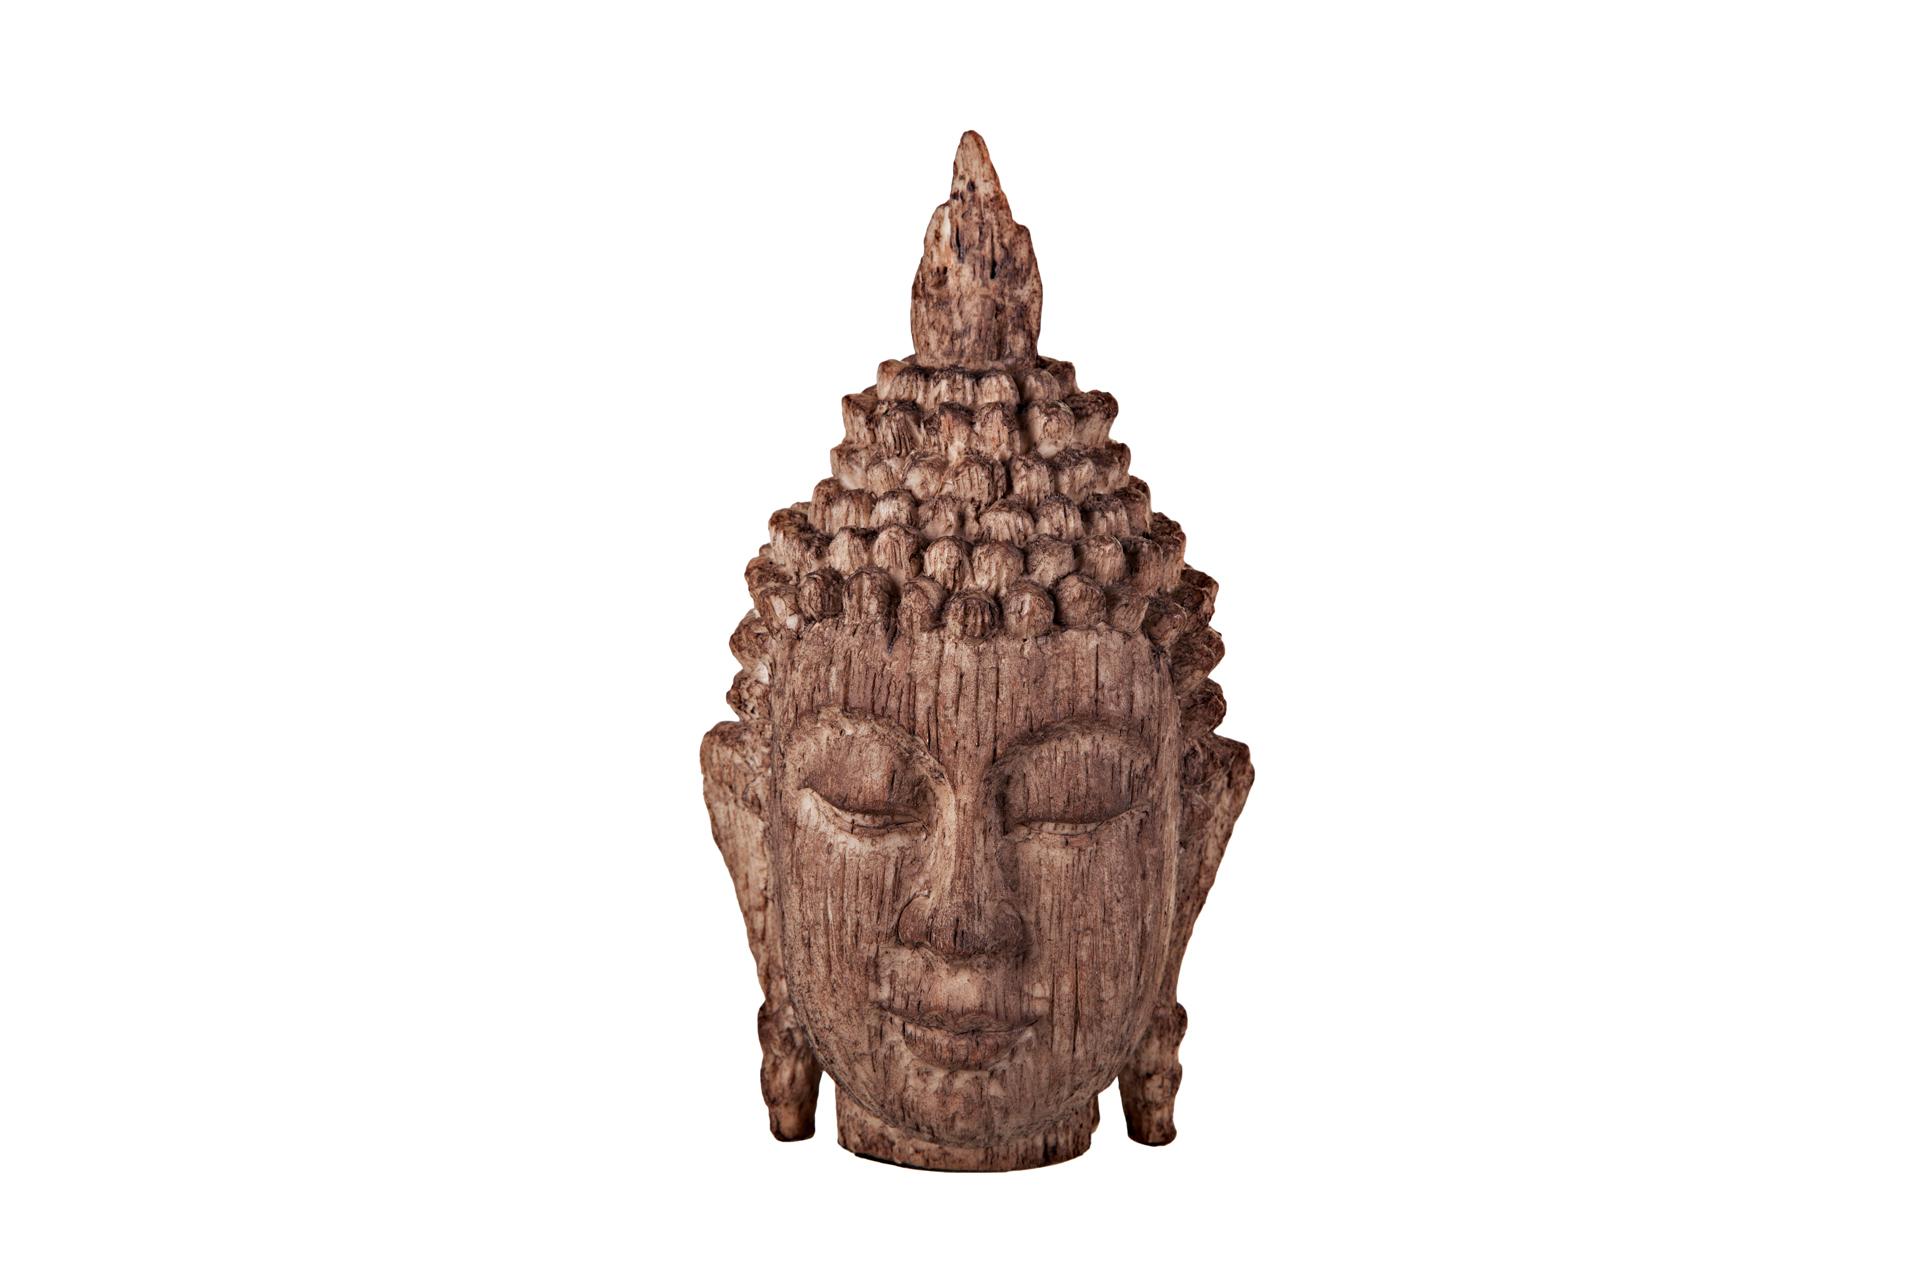 {} ARTEVALUCE Статуэтка Голова Будды (11х12х20 см) статуэтка петушок 12 см